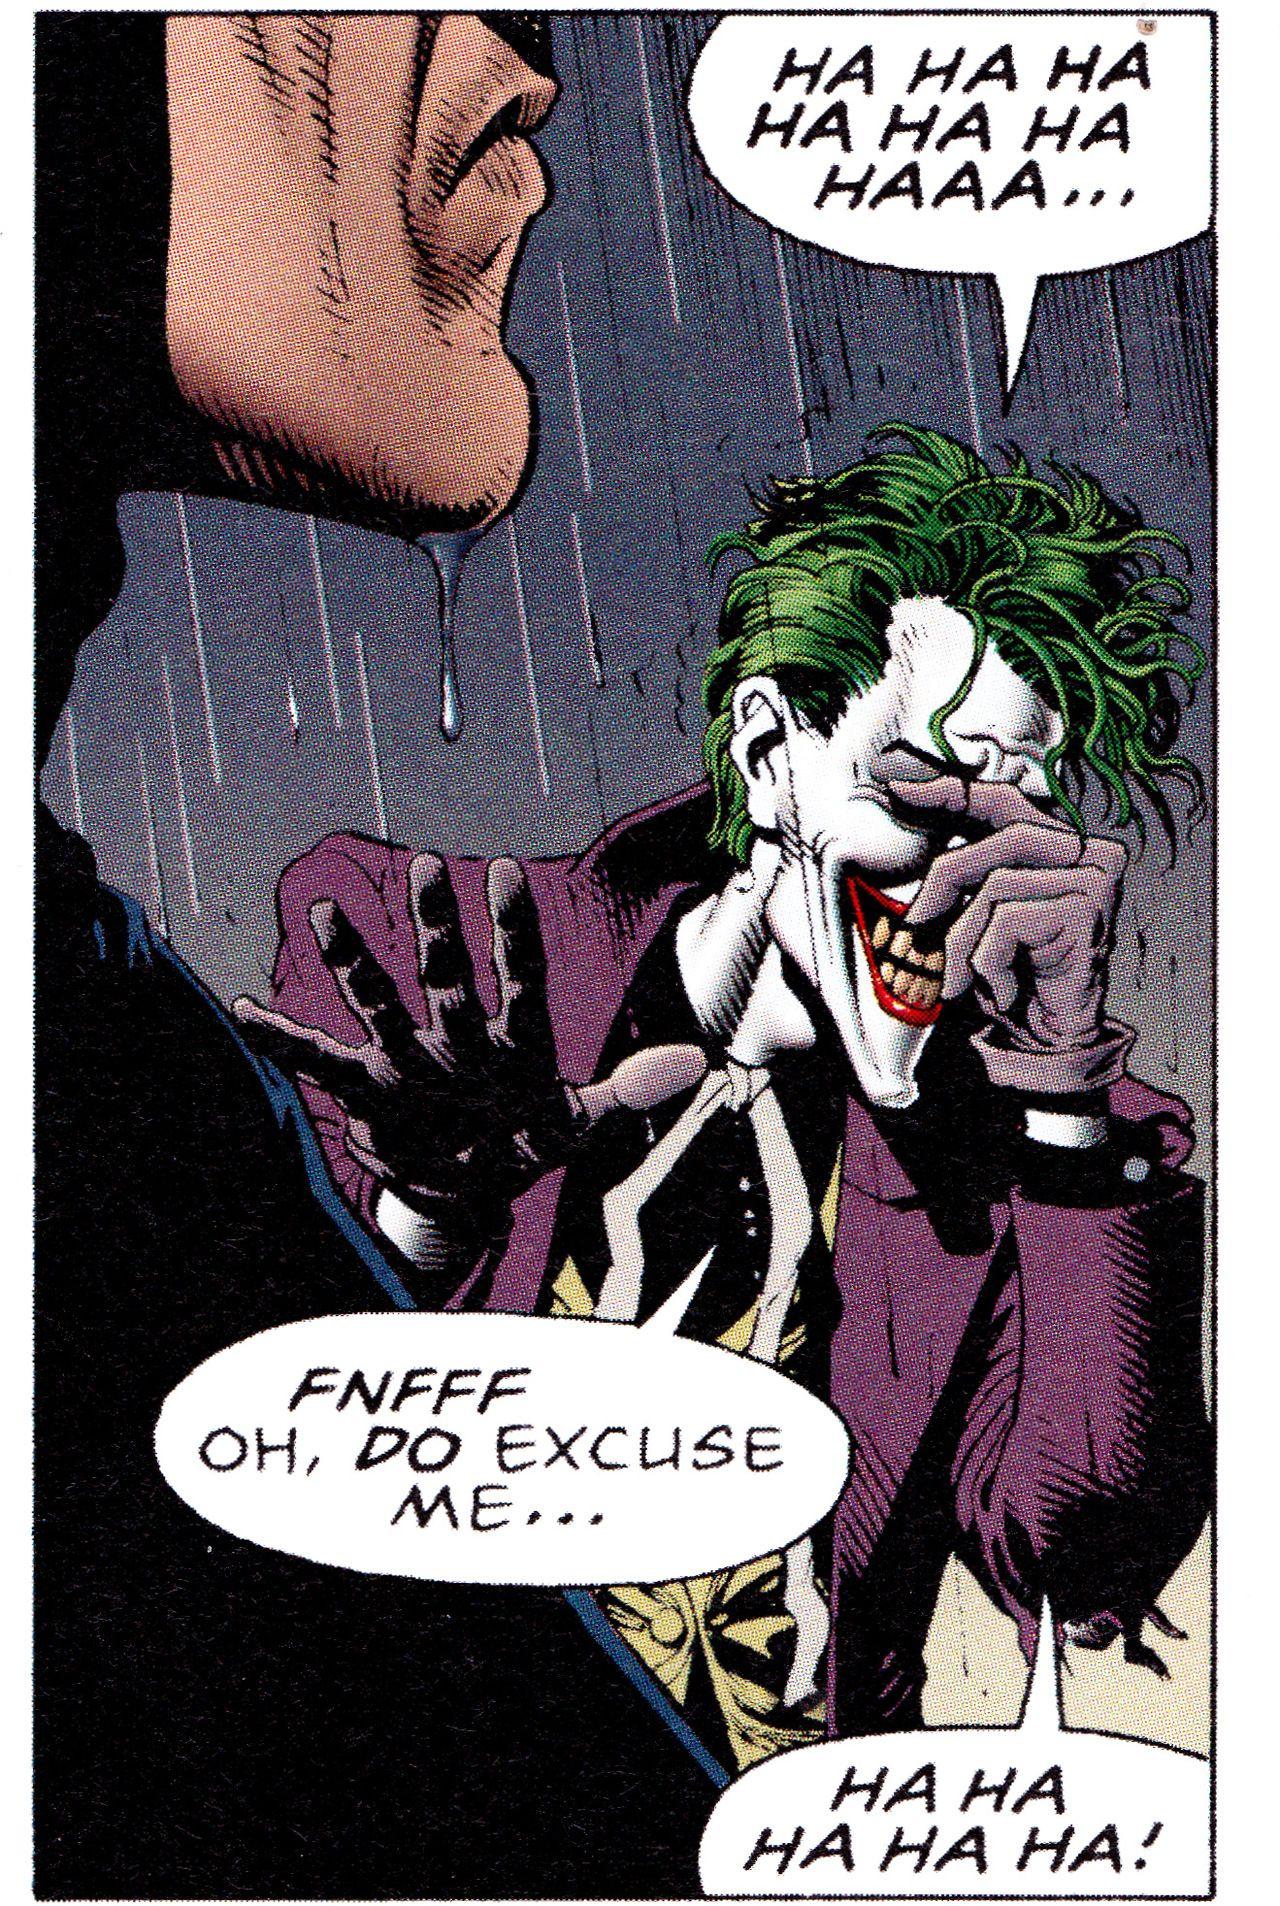 Batman: The Killing Joke Animated Movie Gets R Rating